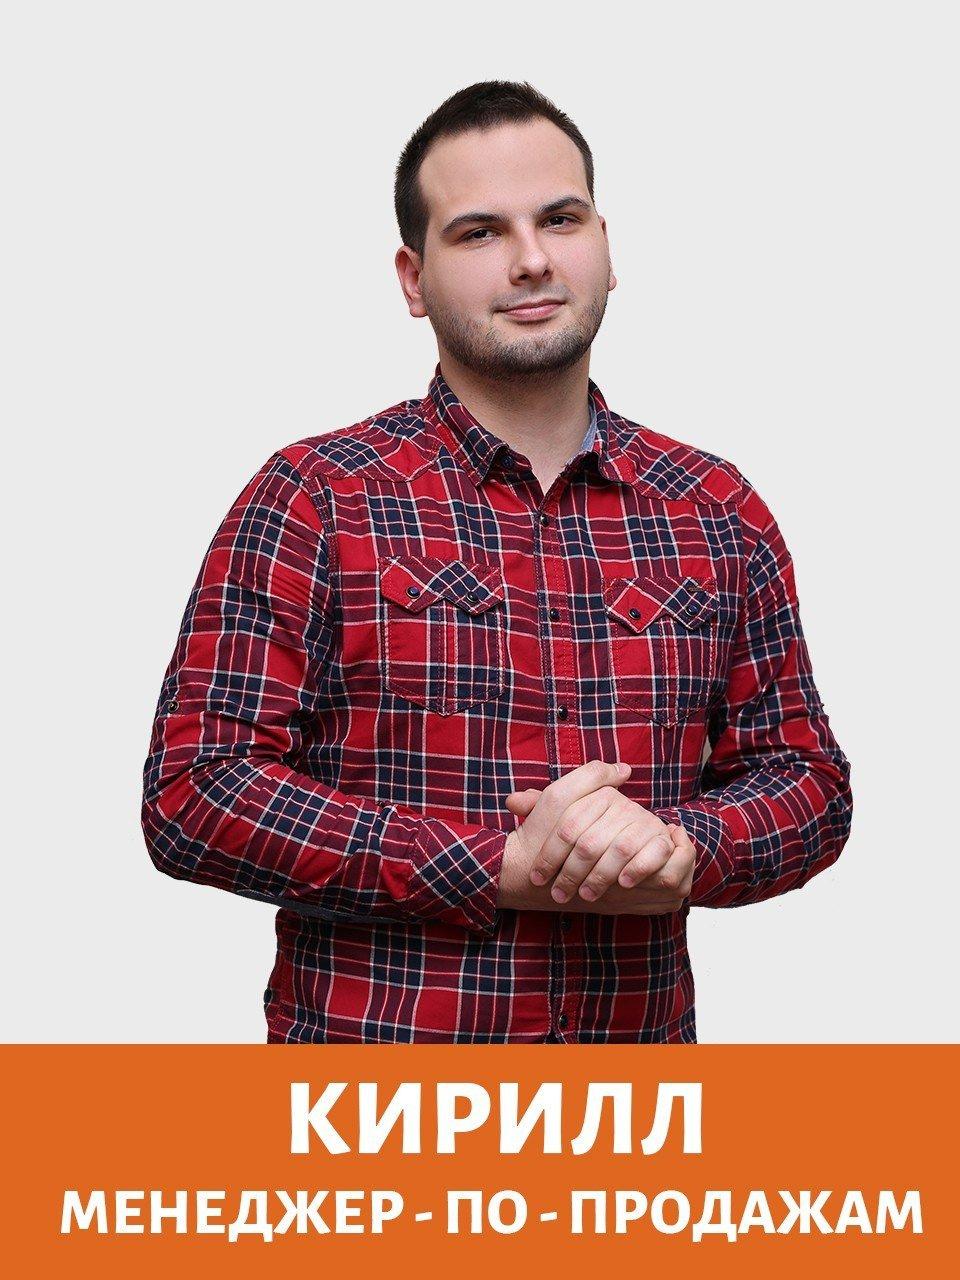 kirill menedzhe po prodazham - Создание и разработка сайтов в Актобе